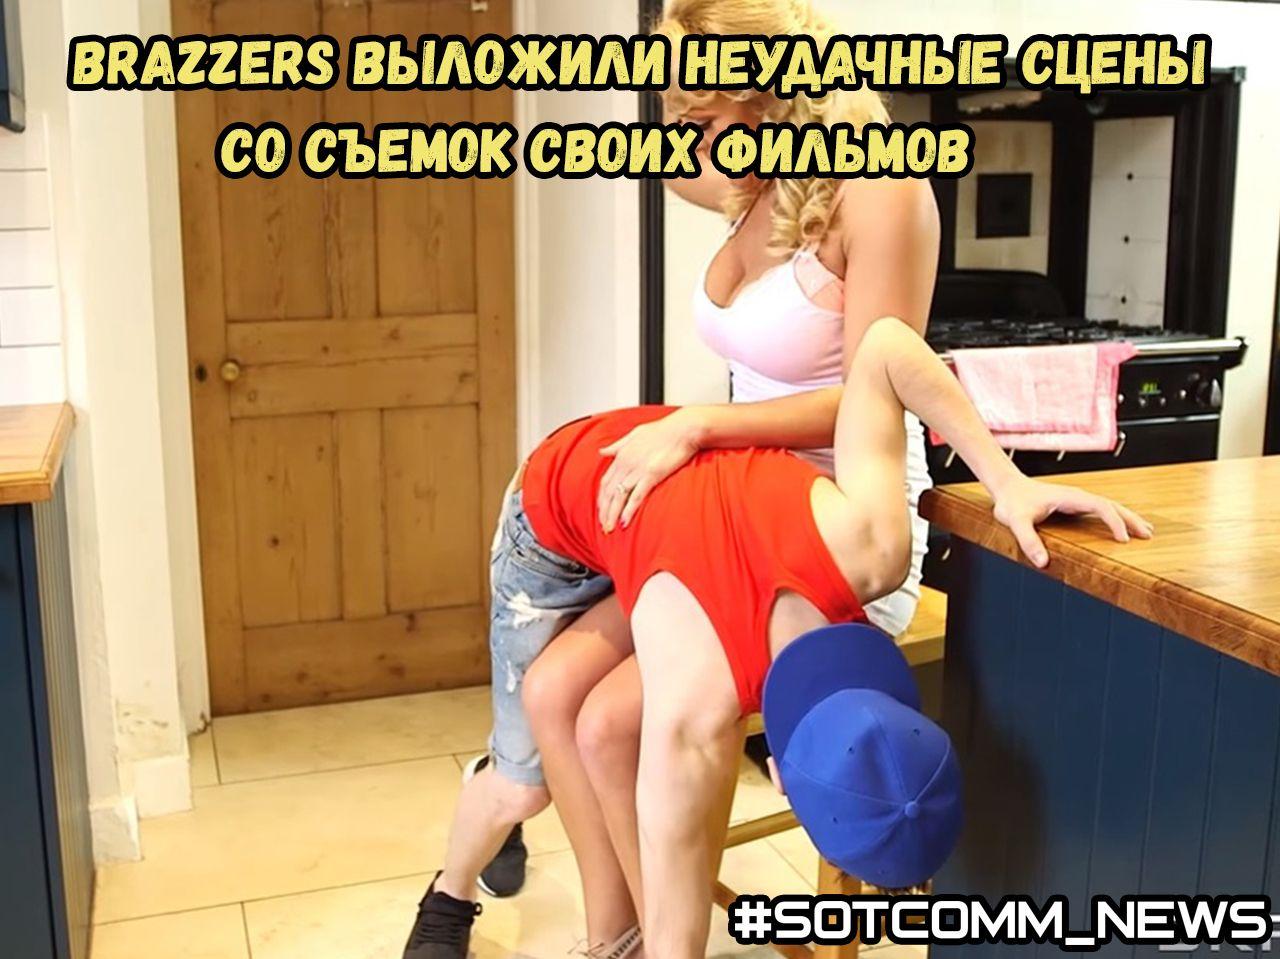 Brazzers выложили неудачные сцены со съемок